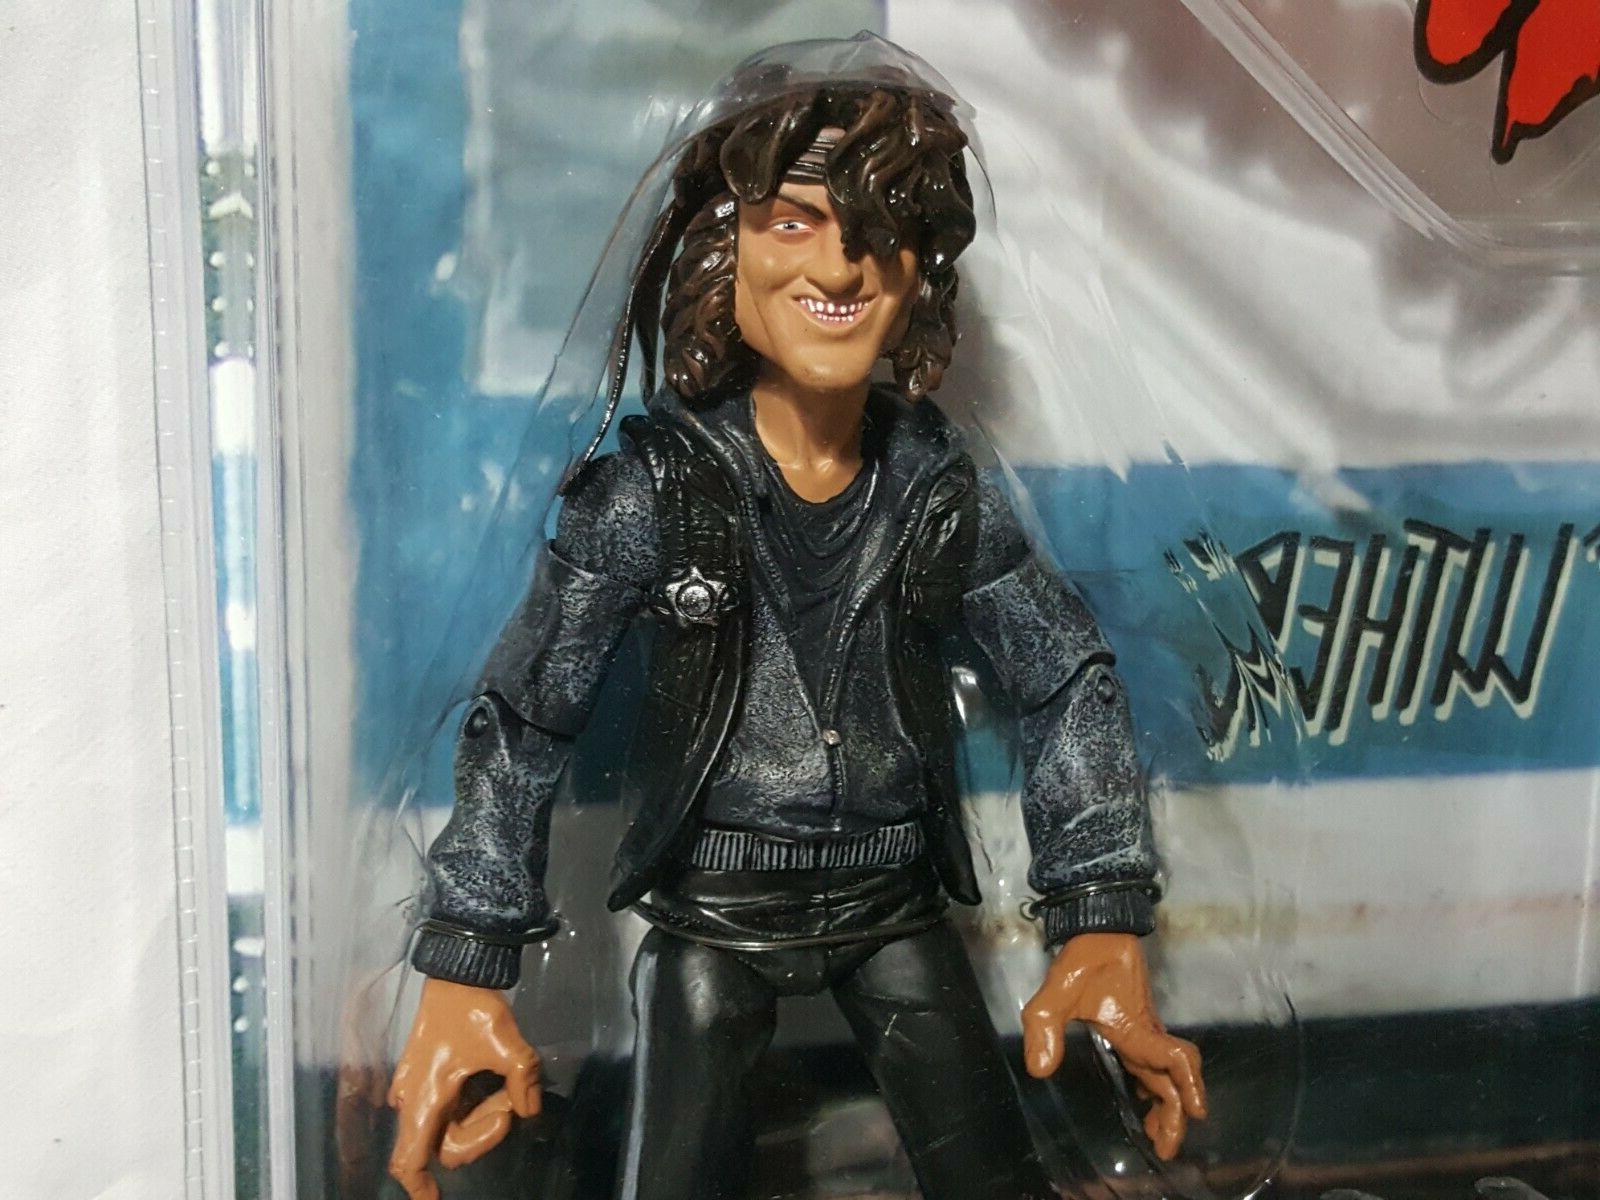 NEW The Mezco Figure toy